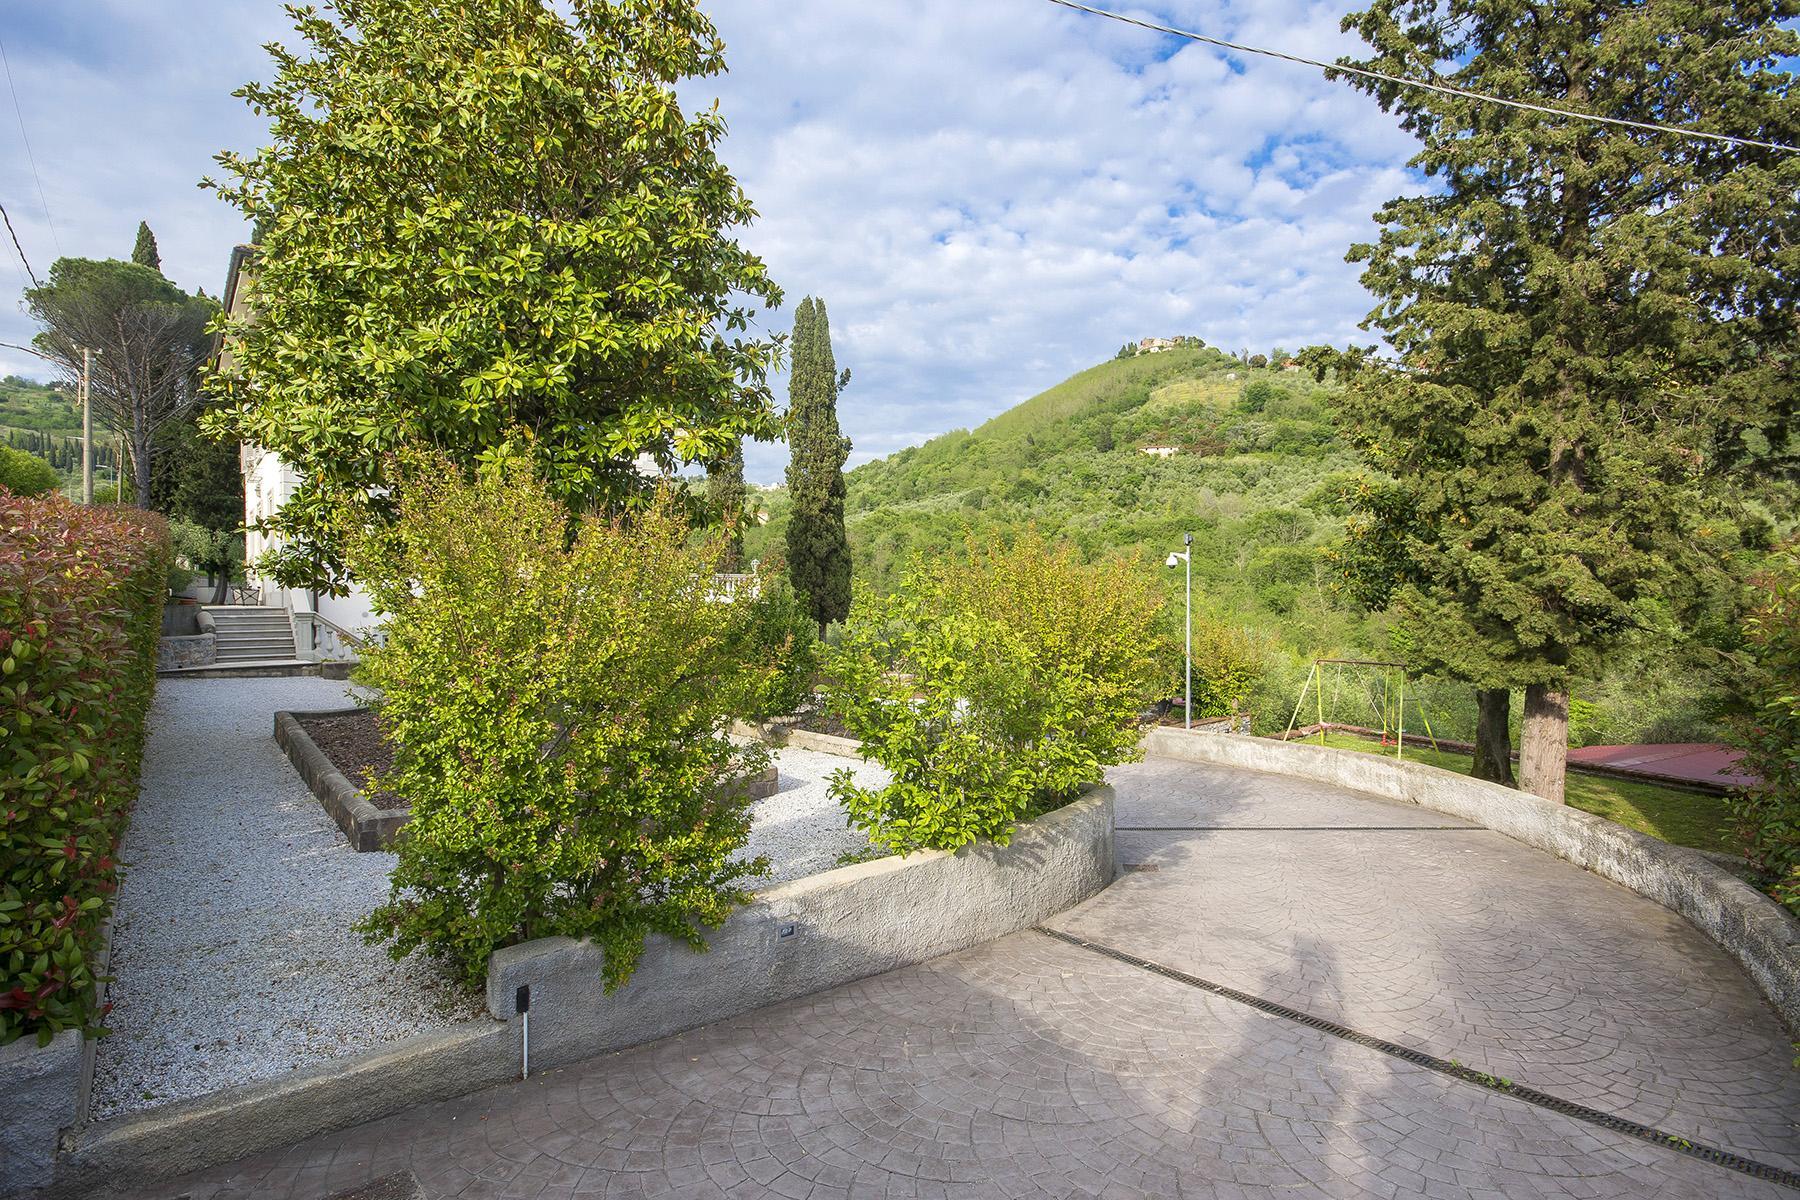 Montecatini Terme小镇优雅的新艺术风格的别墅 - 37